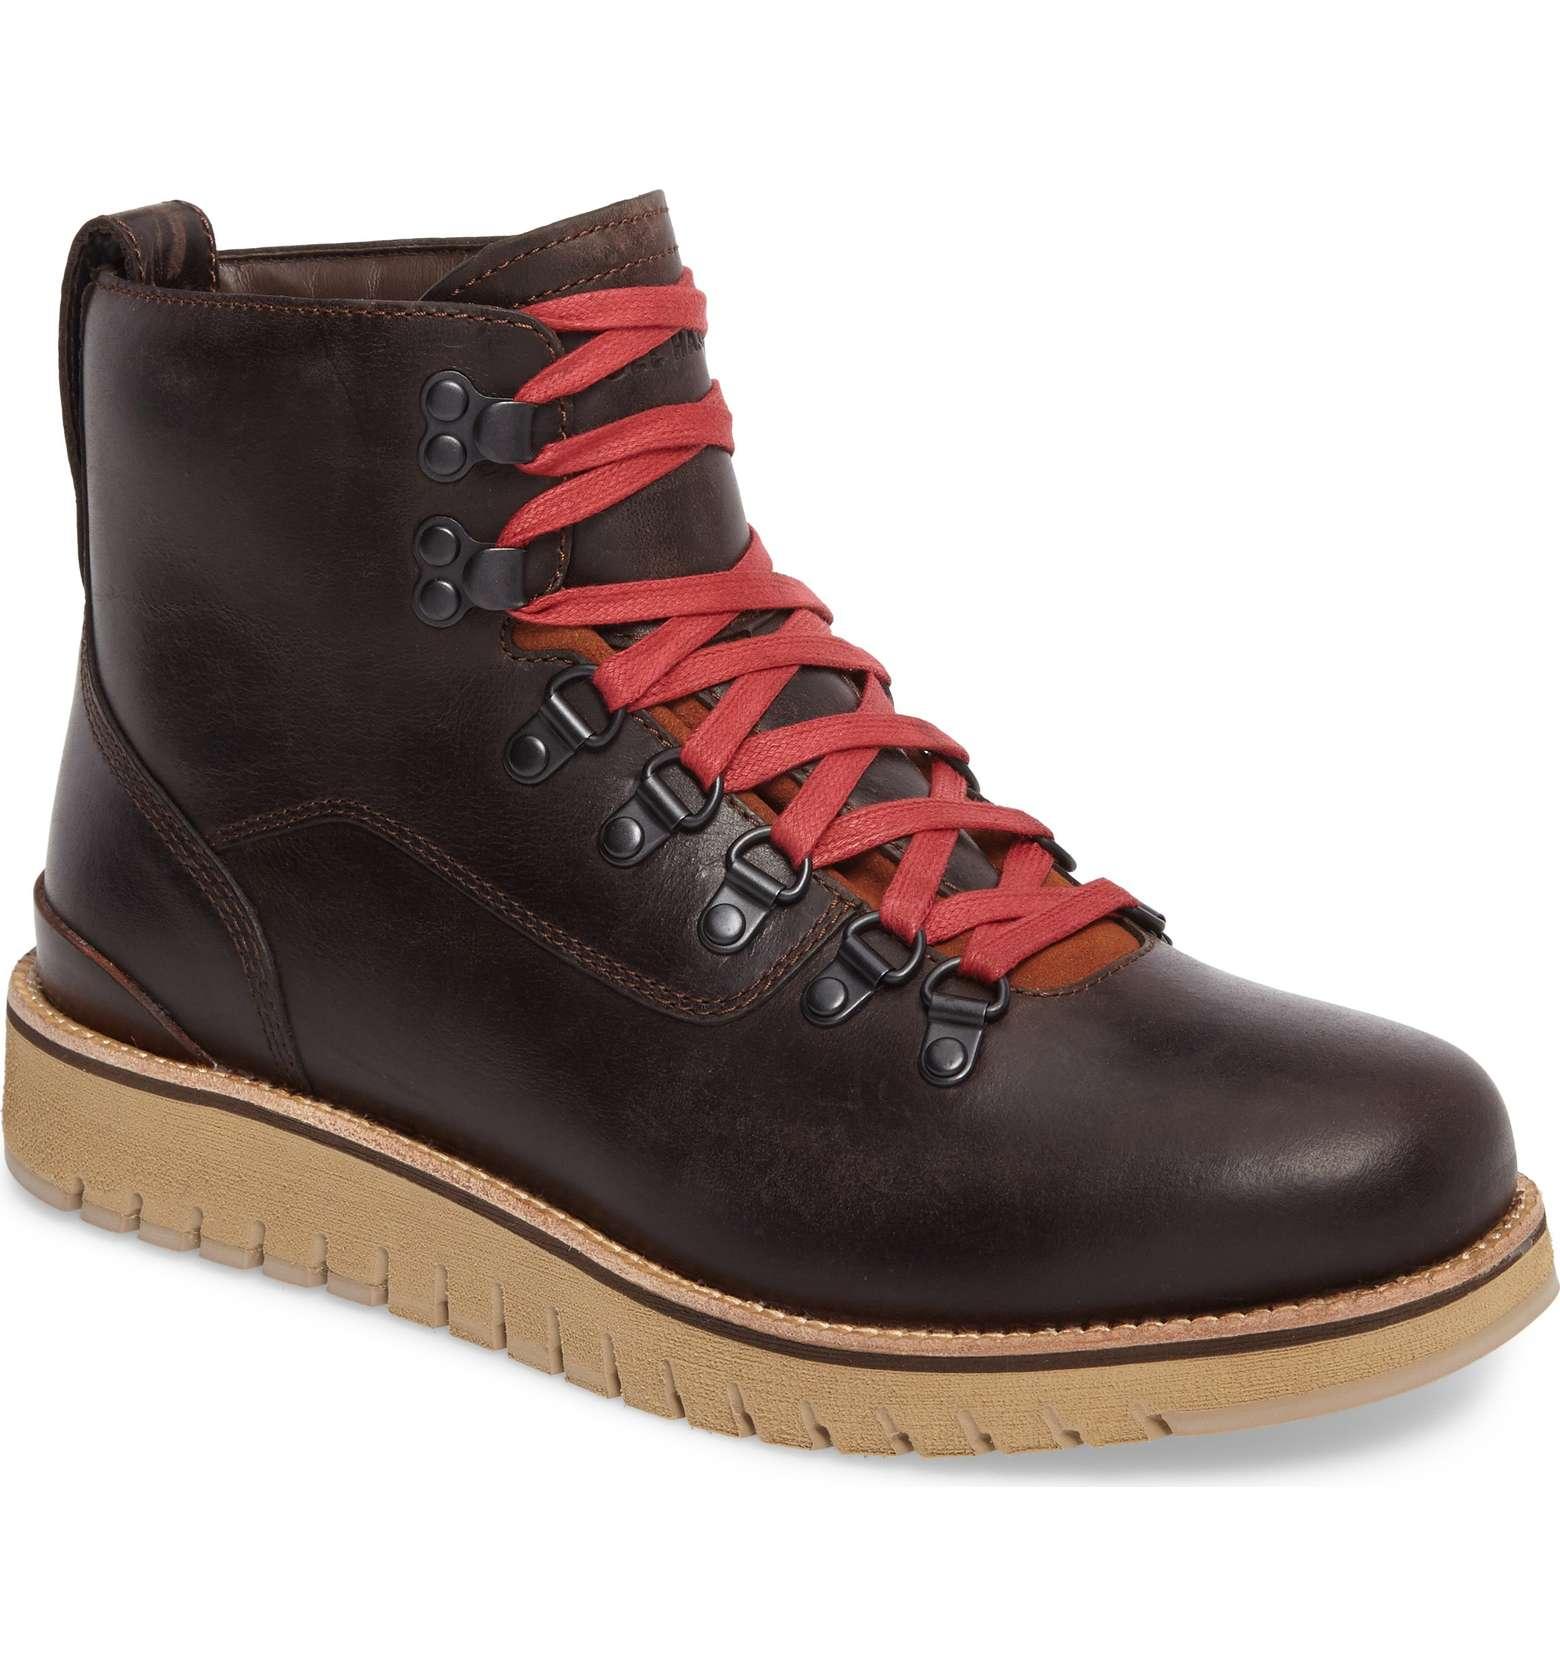 Hiking Boot